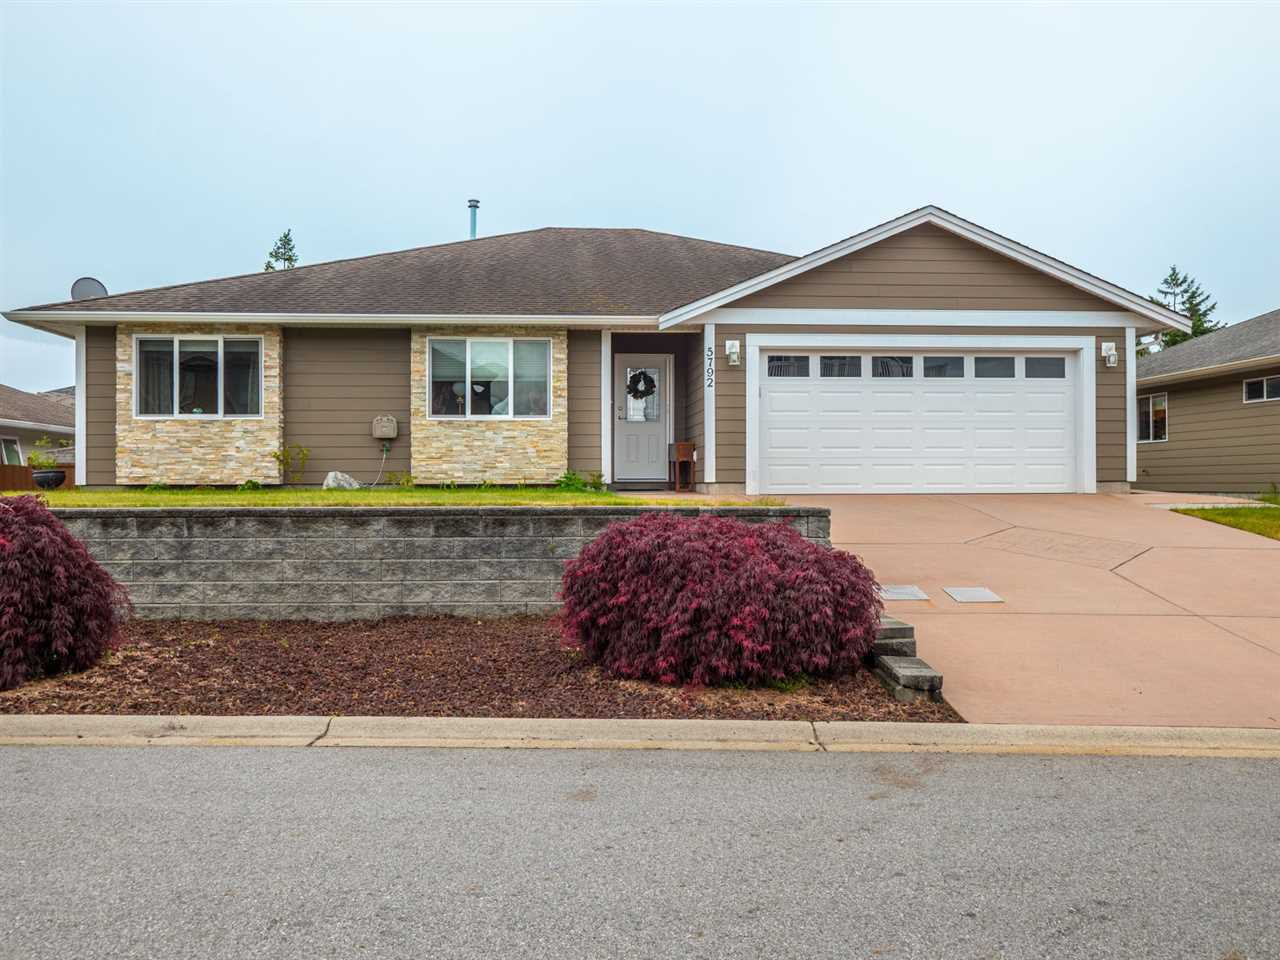 "Main Photo: 5792 GENNI'S Way in Sechelt: Sechelt District House for sale in ""The Ridge"" (Sunshine Coast)  : MLS®# R2387617"